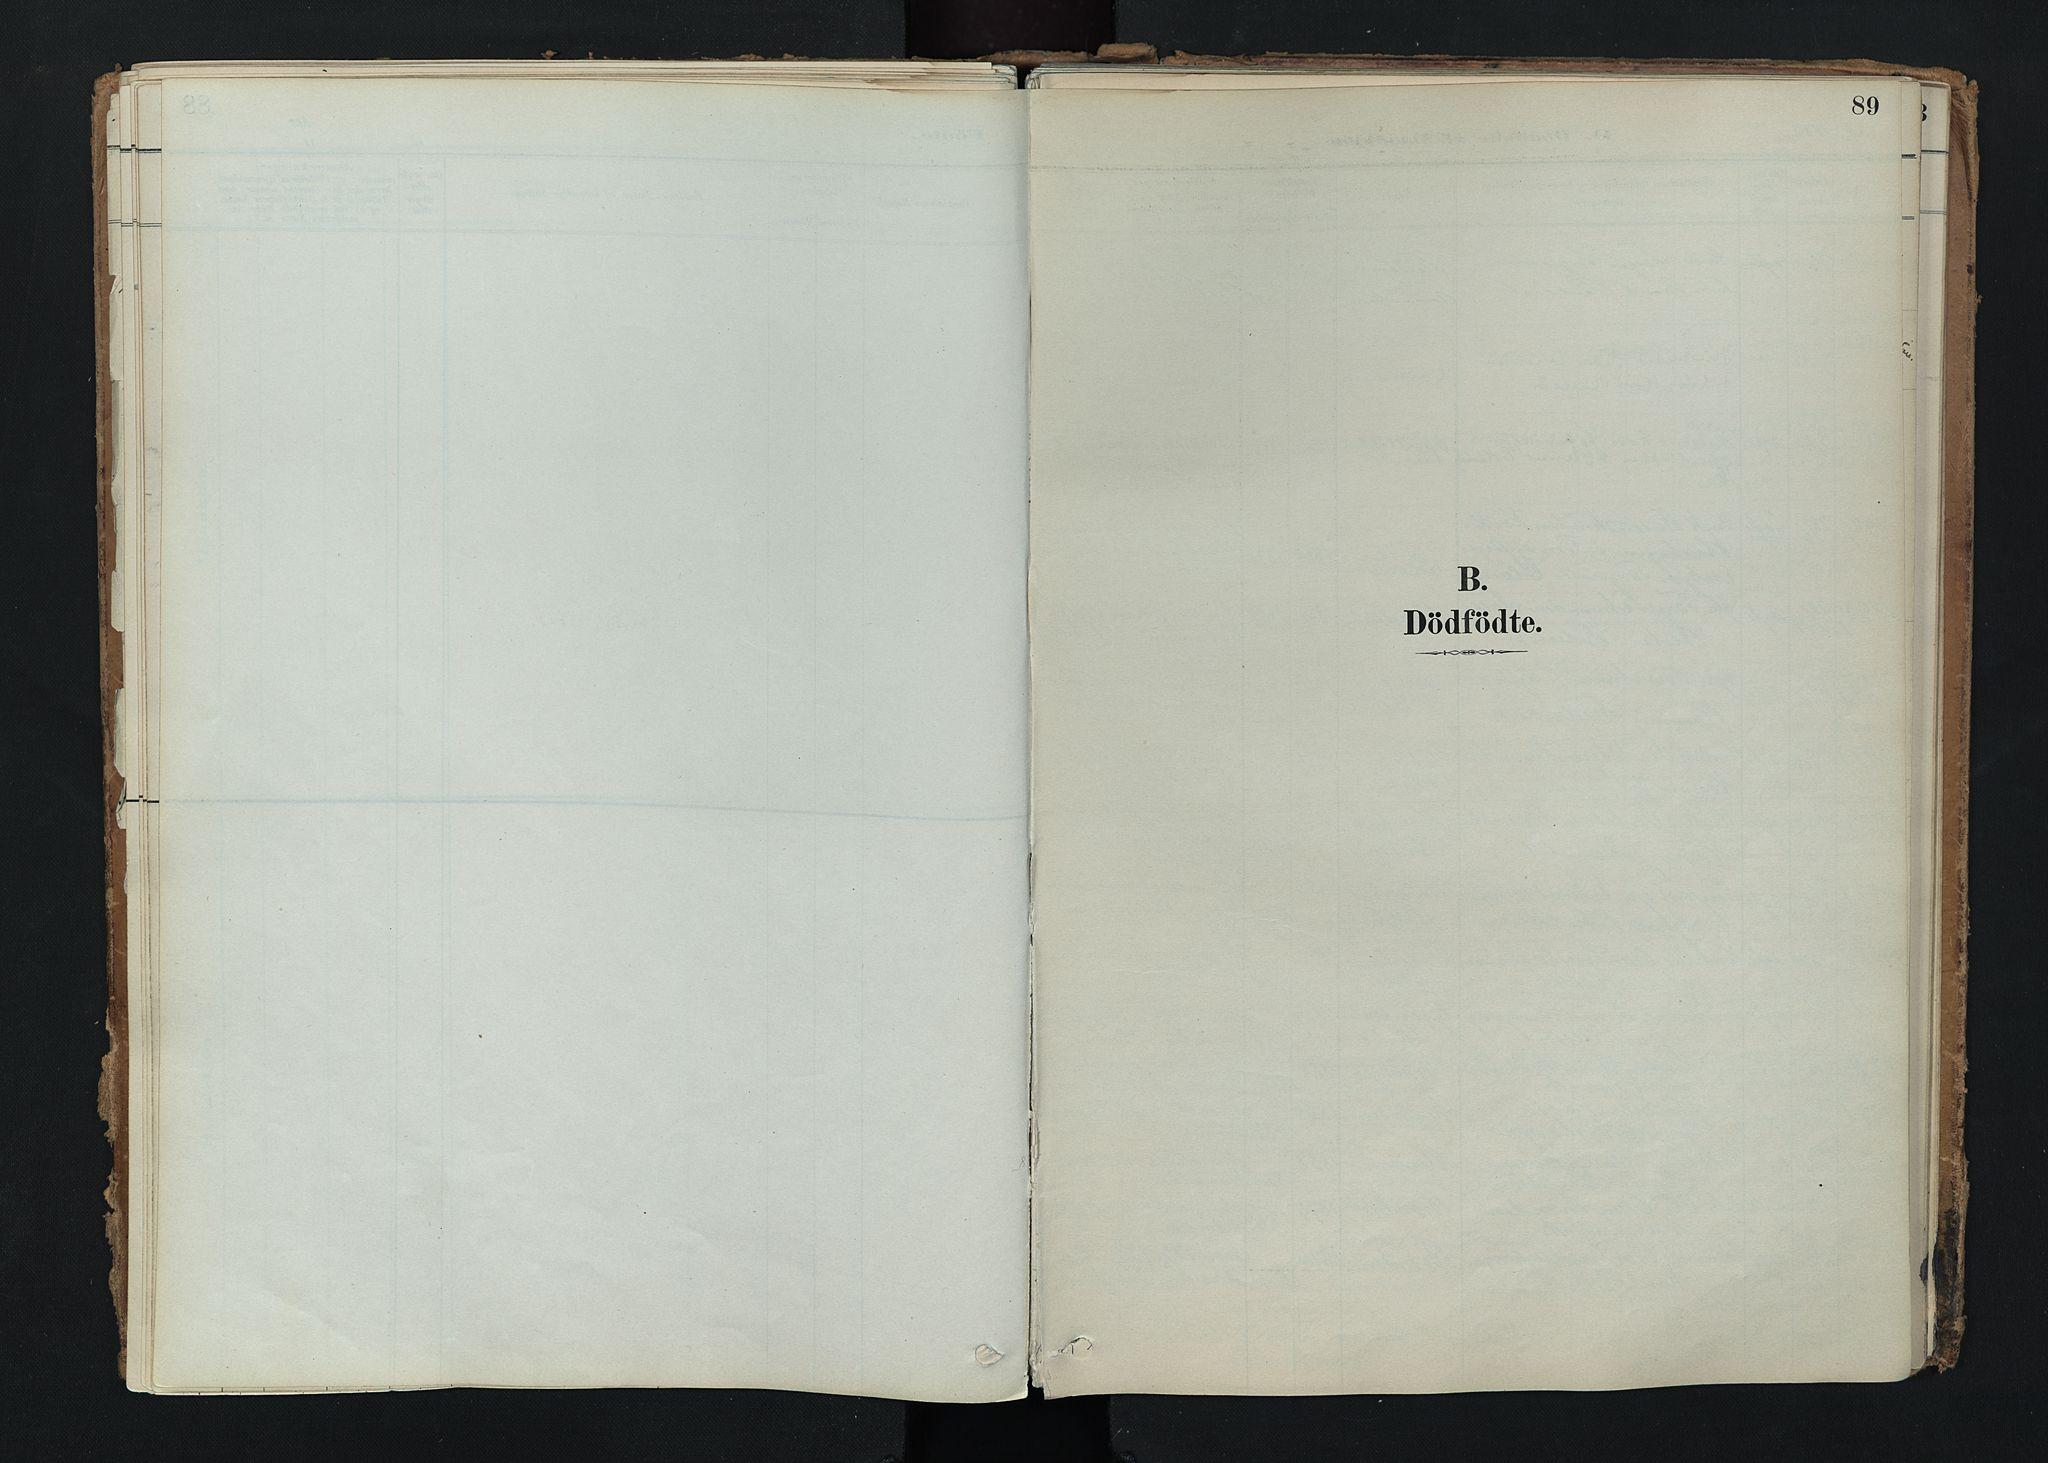 SAH, Nord-Fron prestekontor, Ministerialbok nr. 5, 1884-1914, s. 89